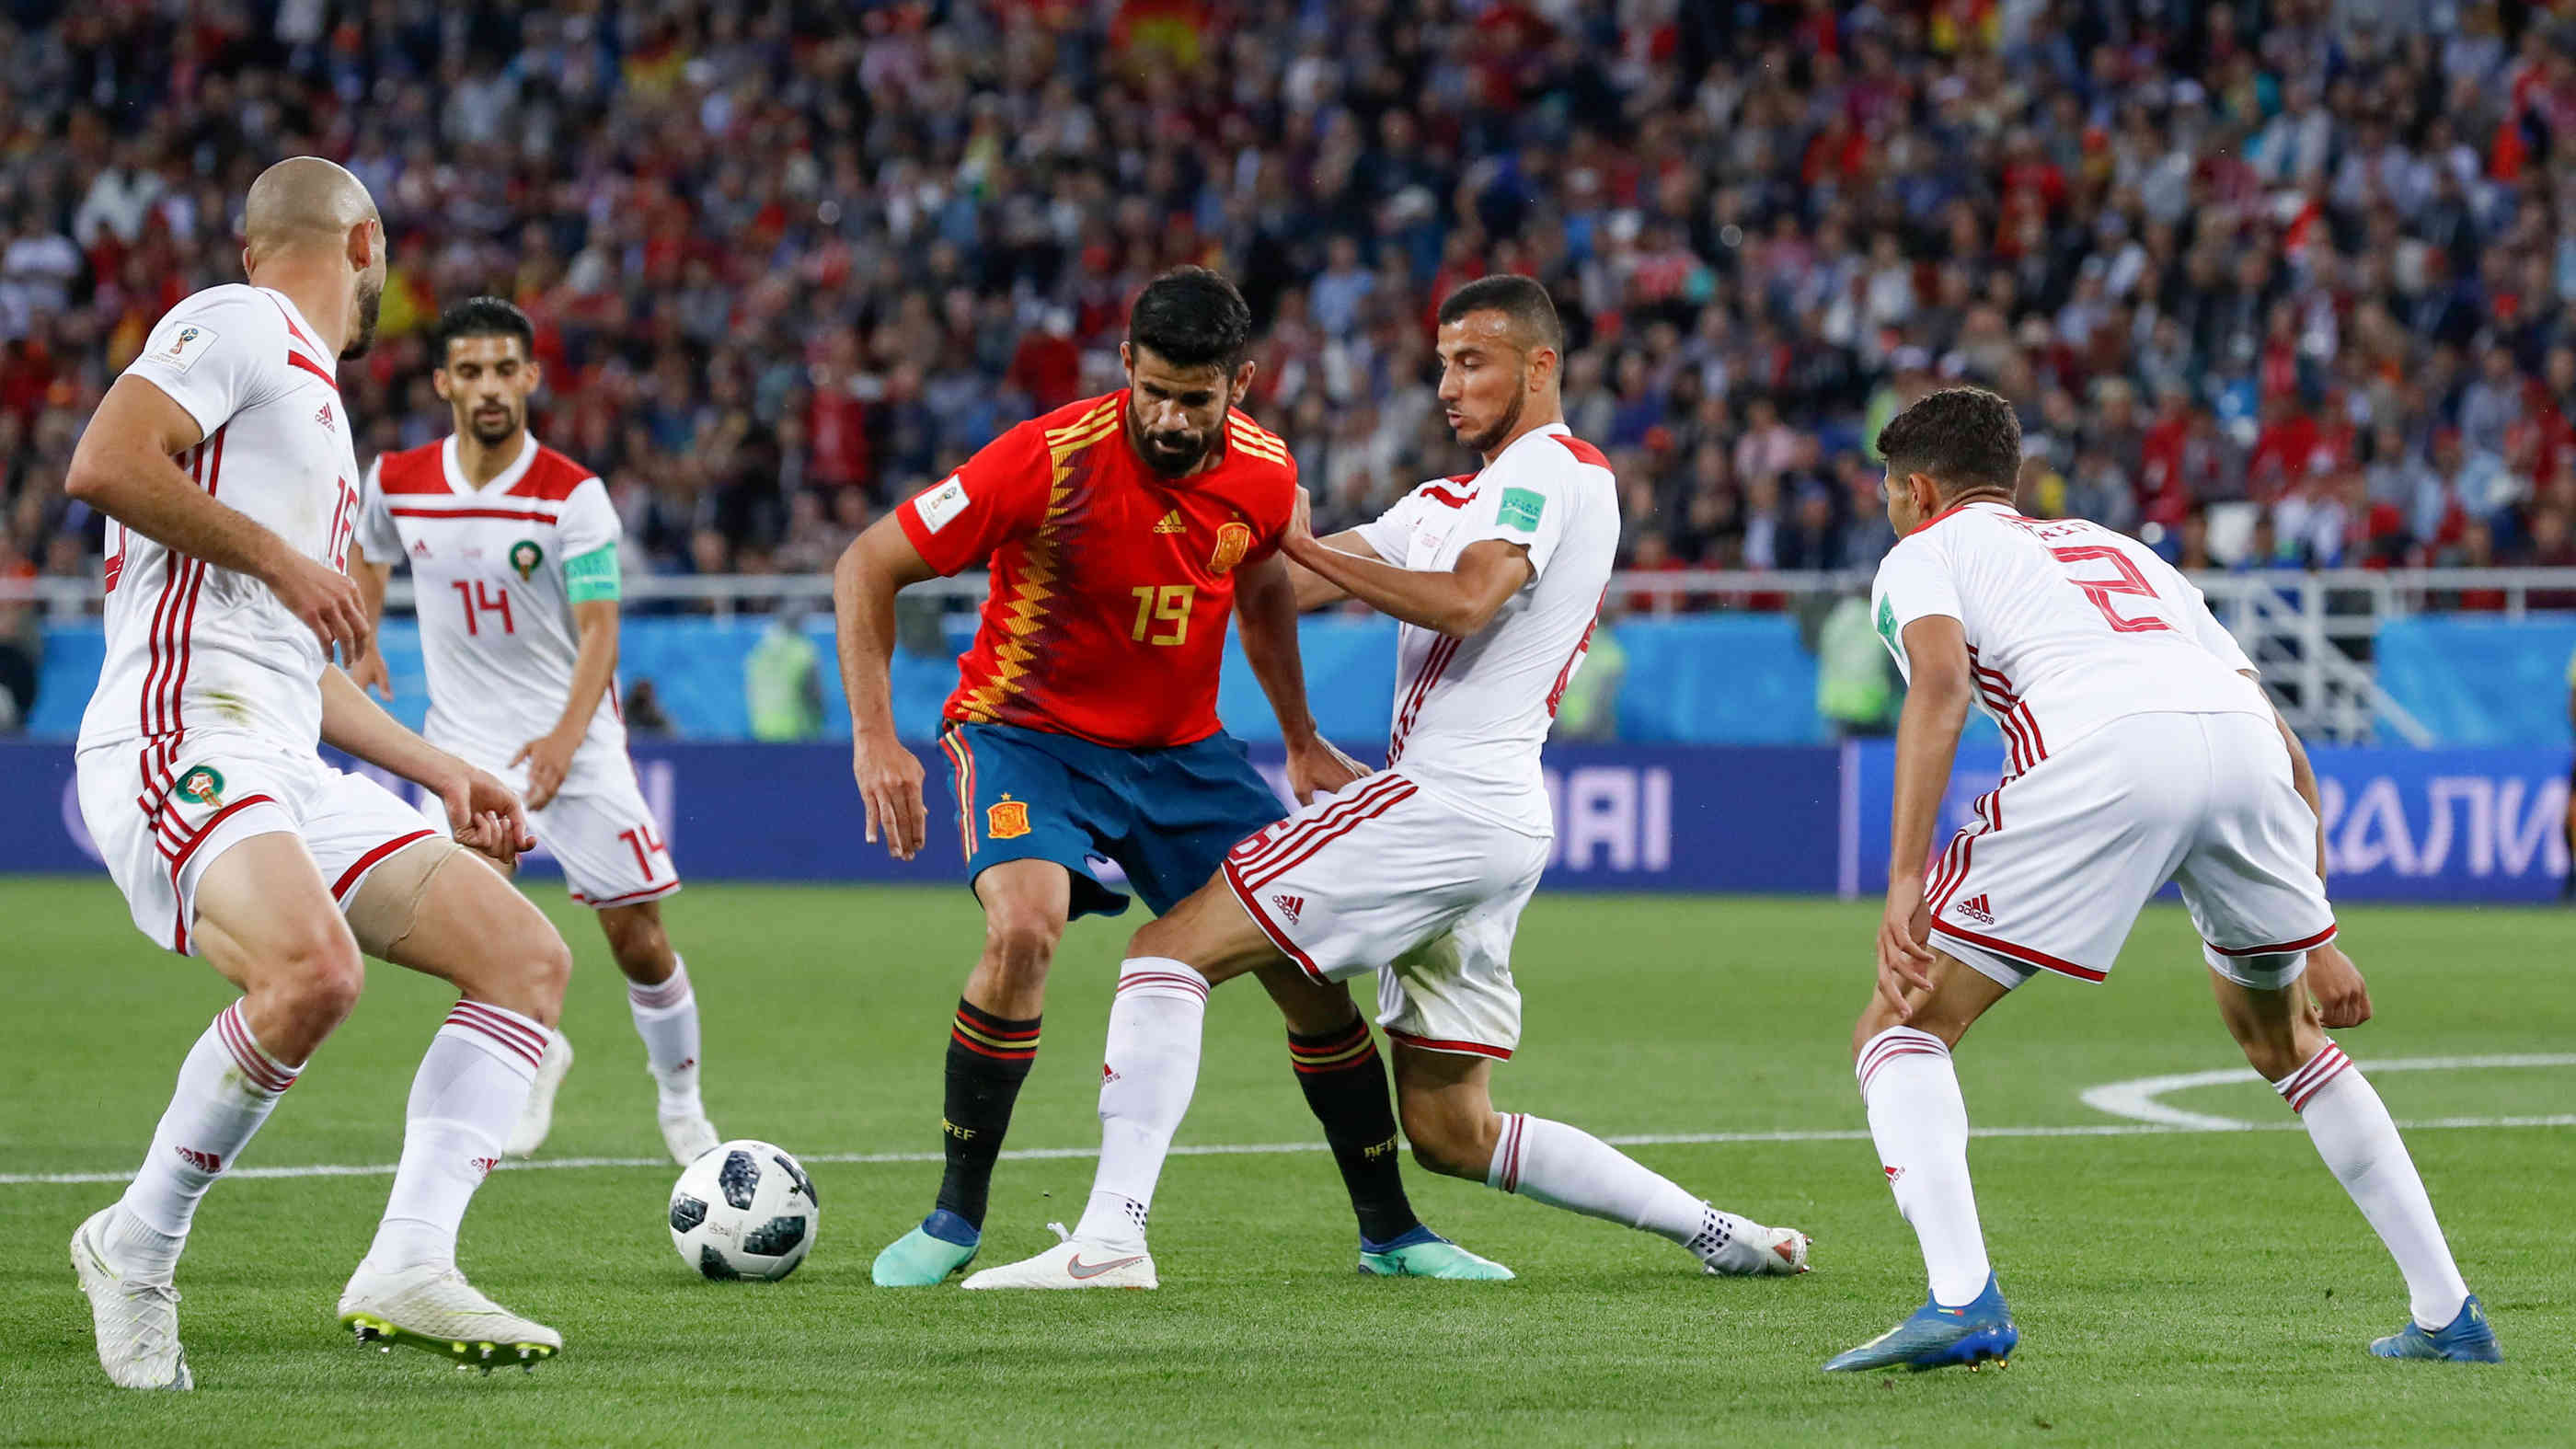 Marokko Gegen Spanien